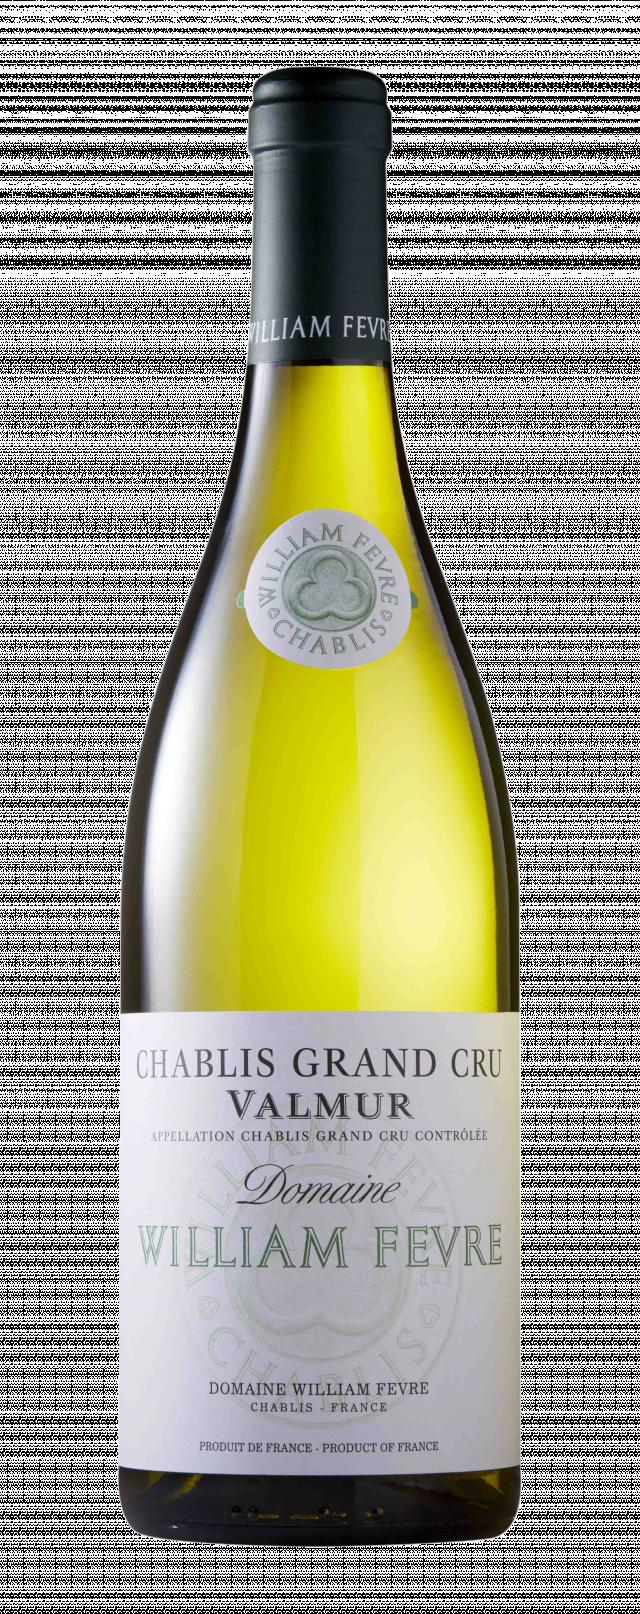 Chablis Grand Cru Valmur Domaine